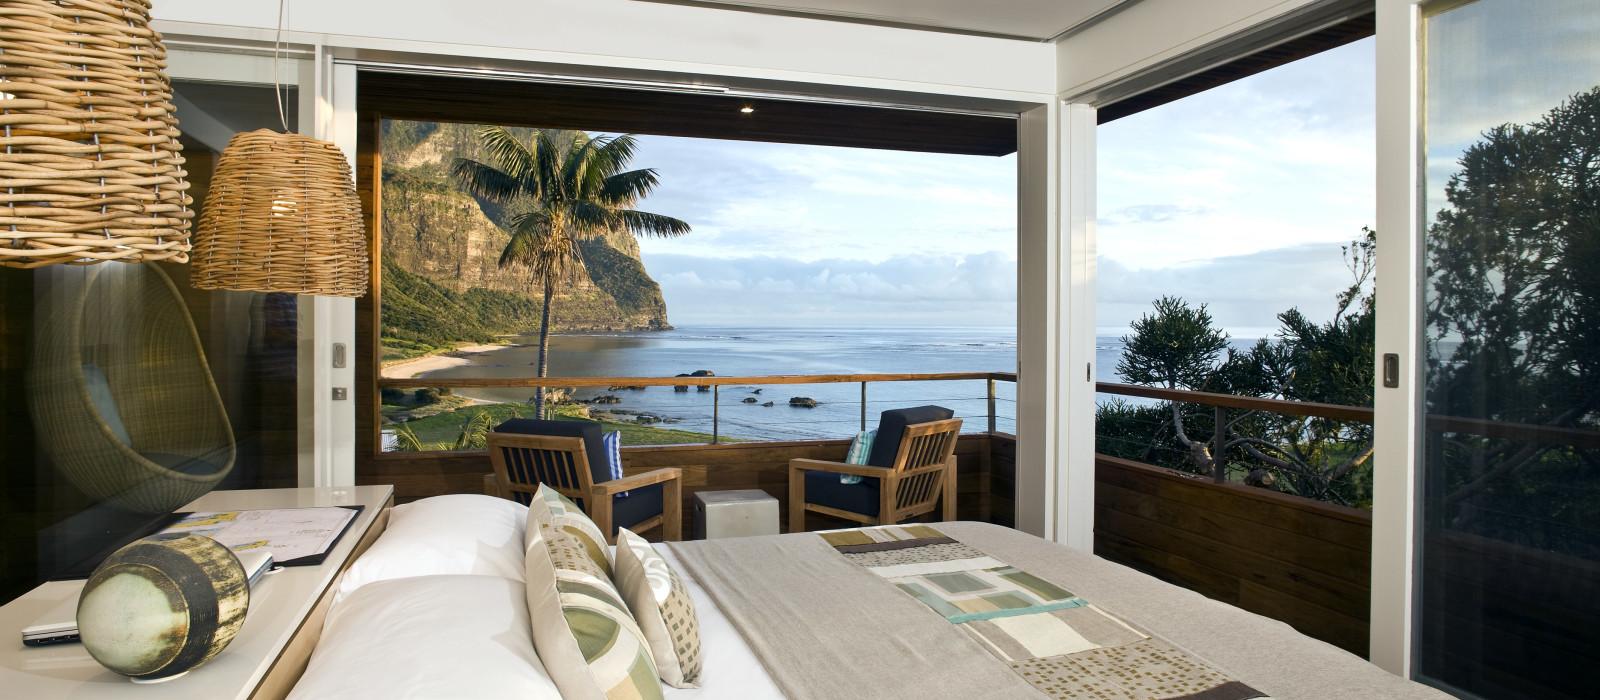 Hotel Capella Lodge Lord Howe Island Australia